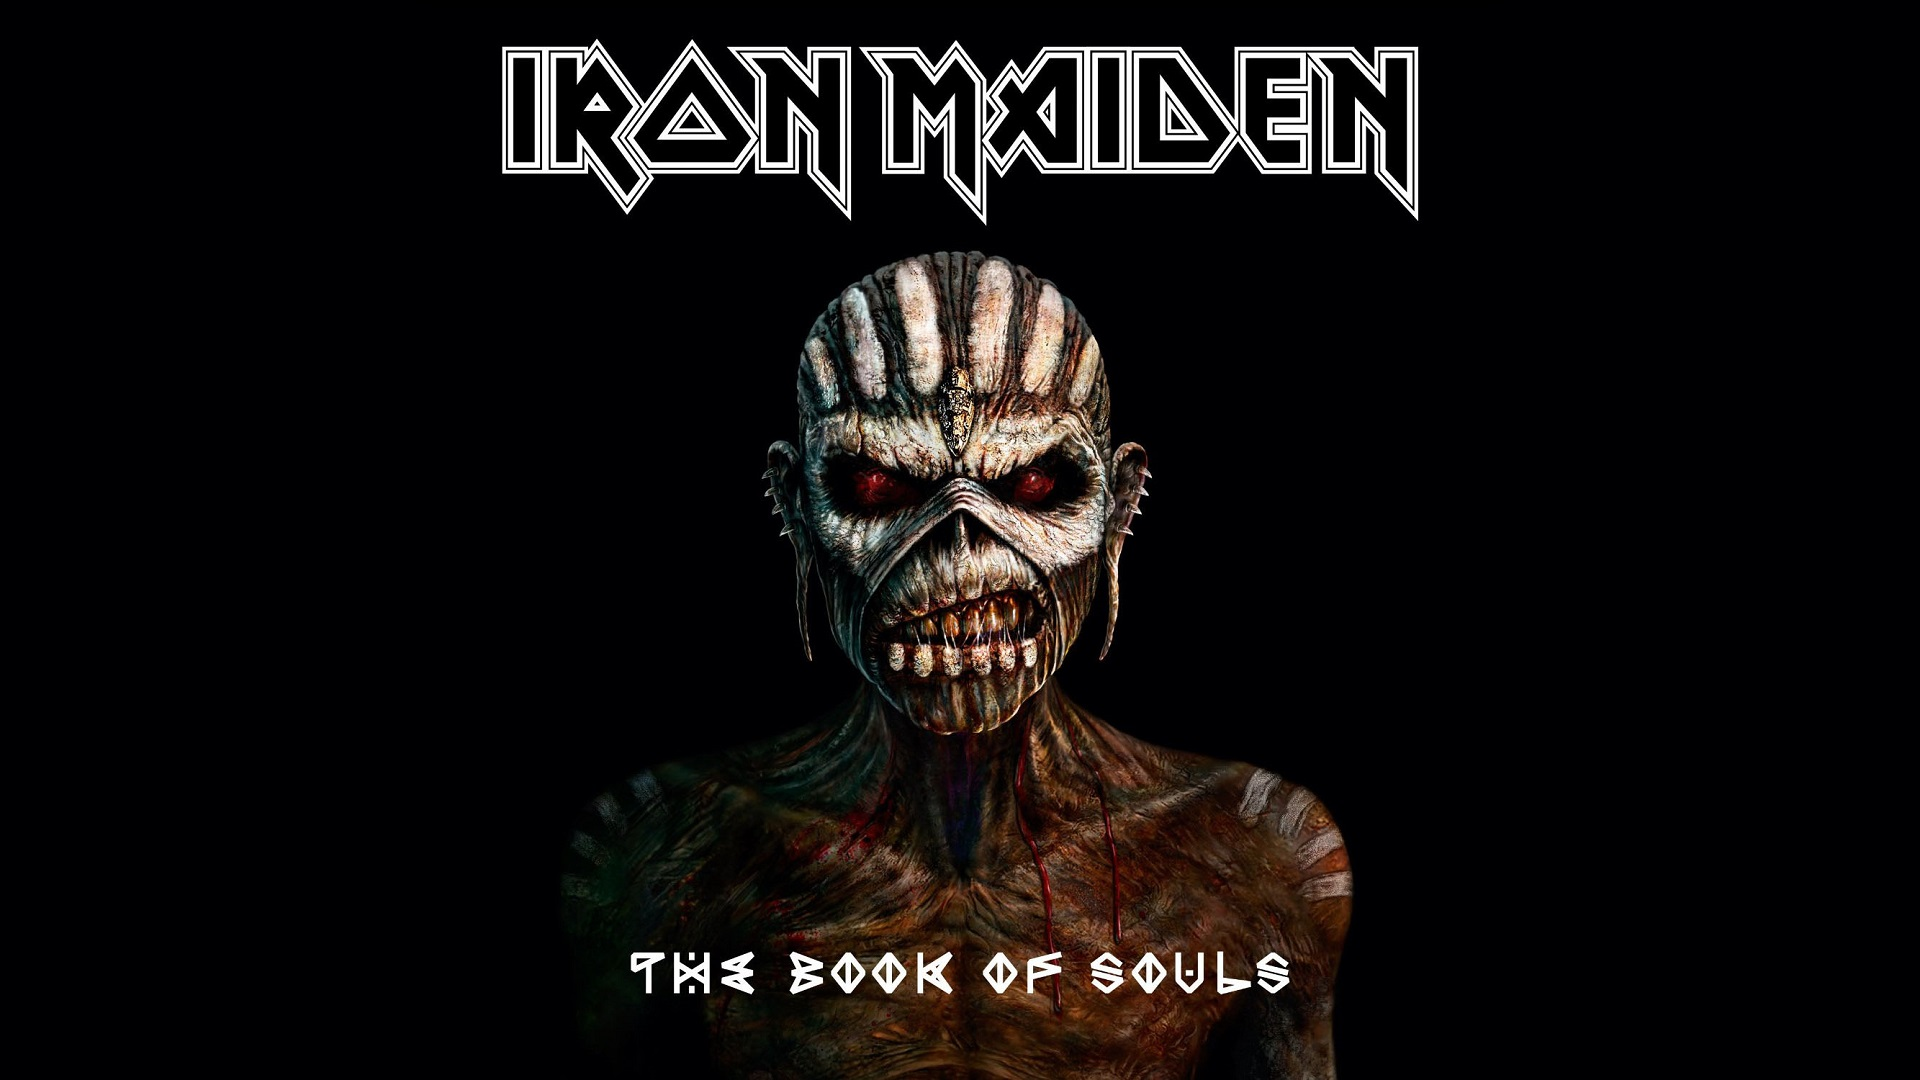 Iron Maiden The Book Of Souls 1080p By Mateelias On Deviantart